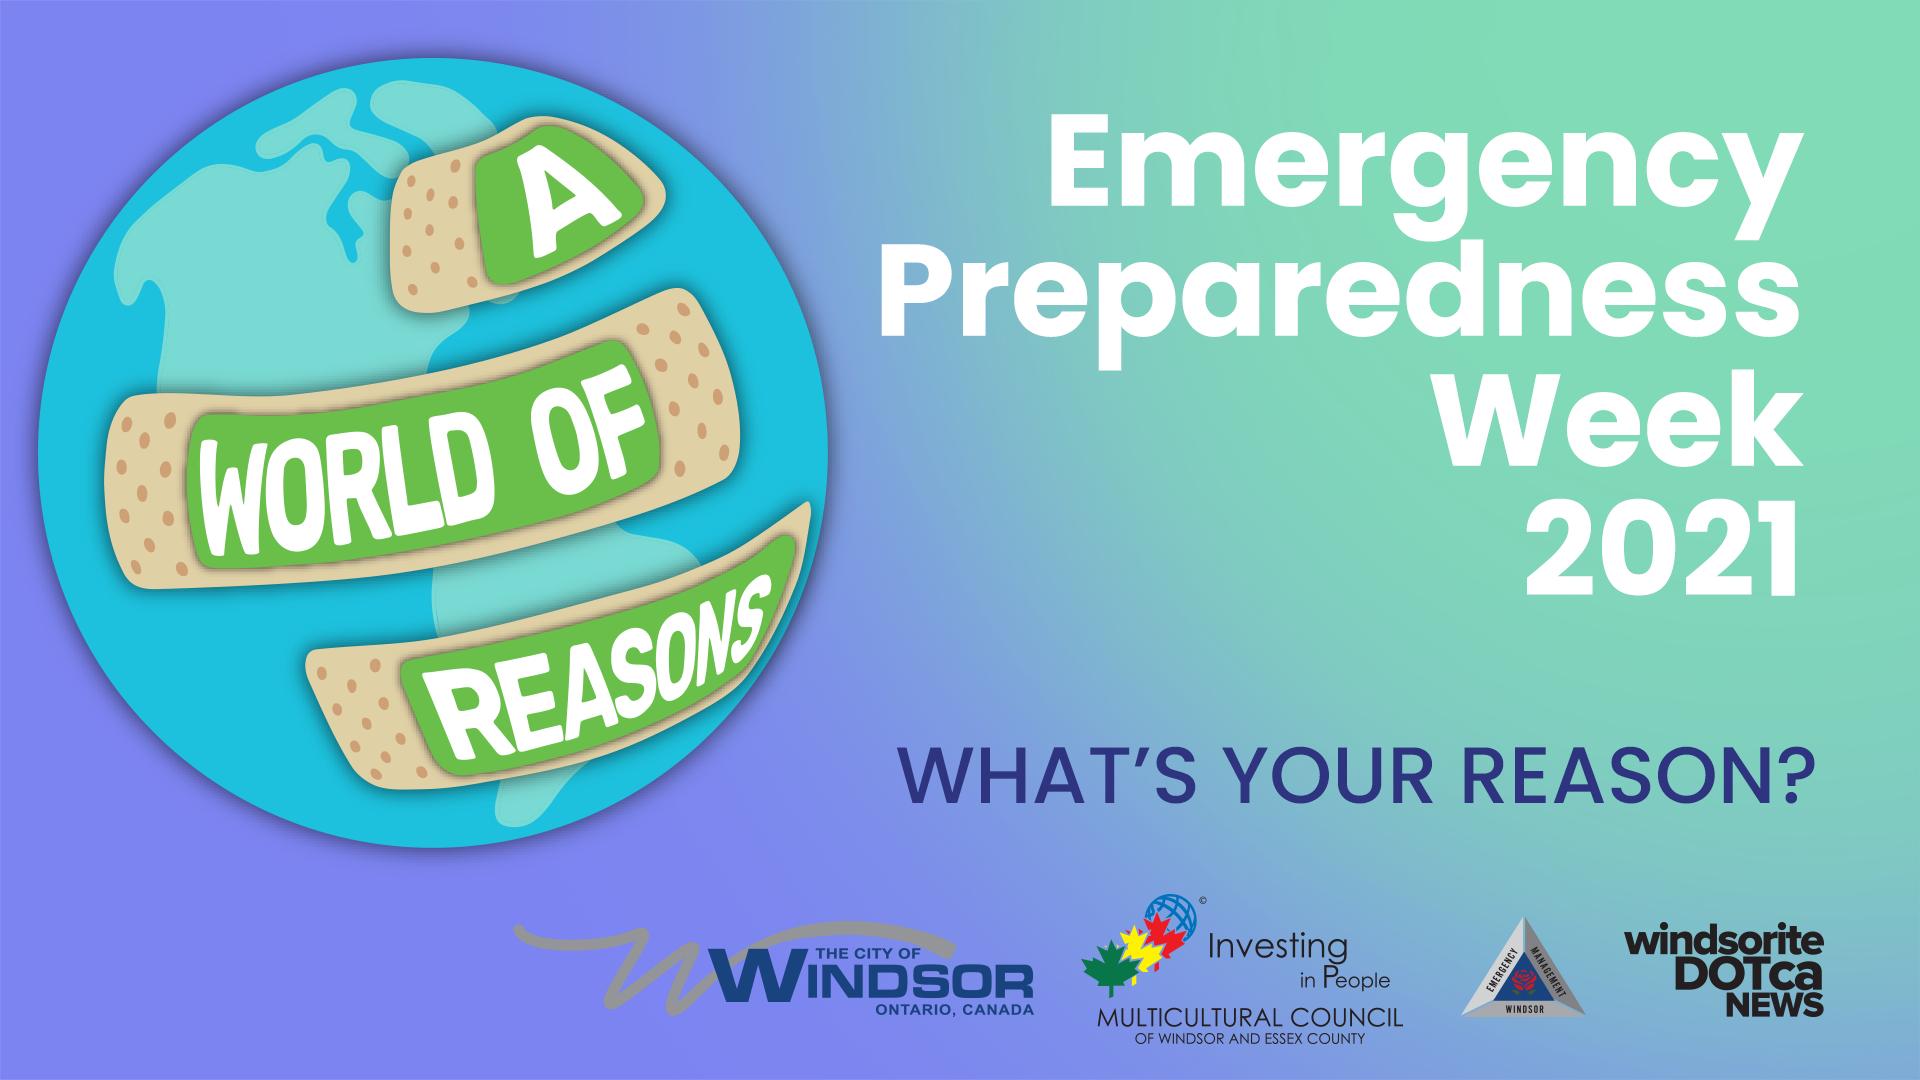 Emergency Preparedness Week 2021. What's Your Reason?